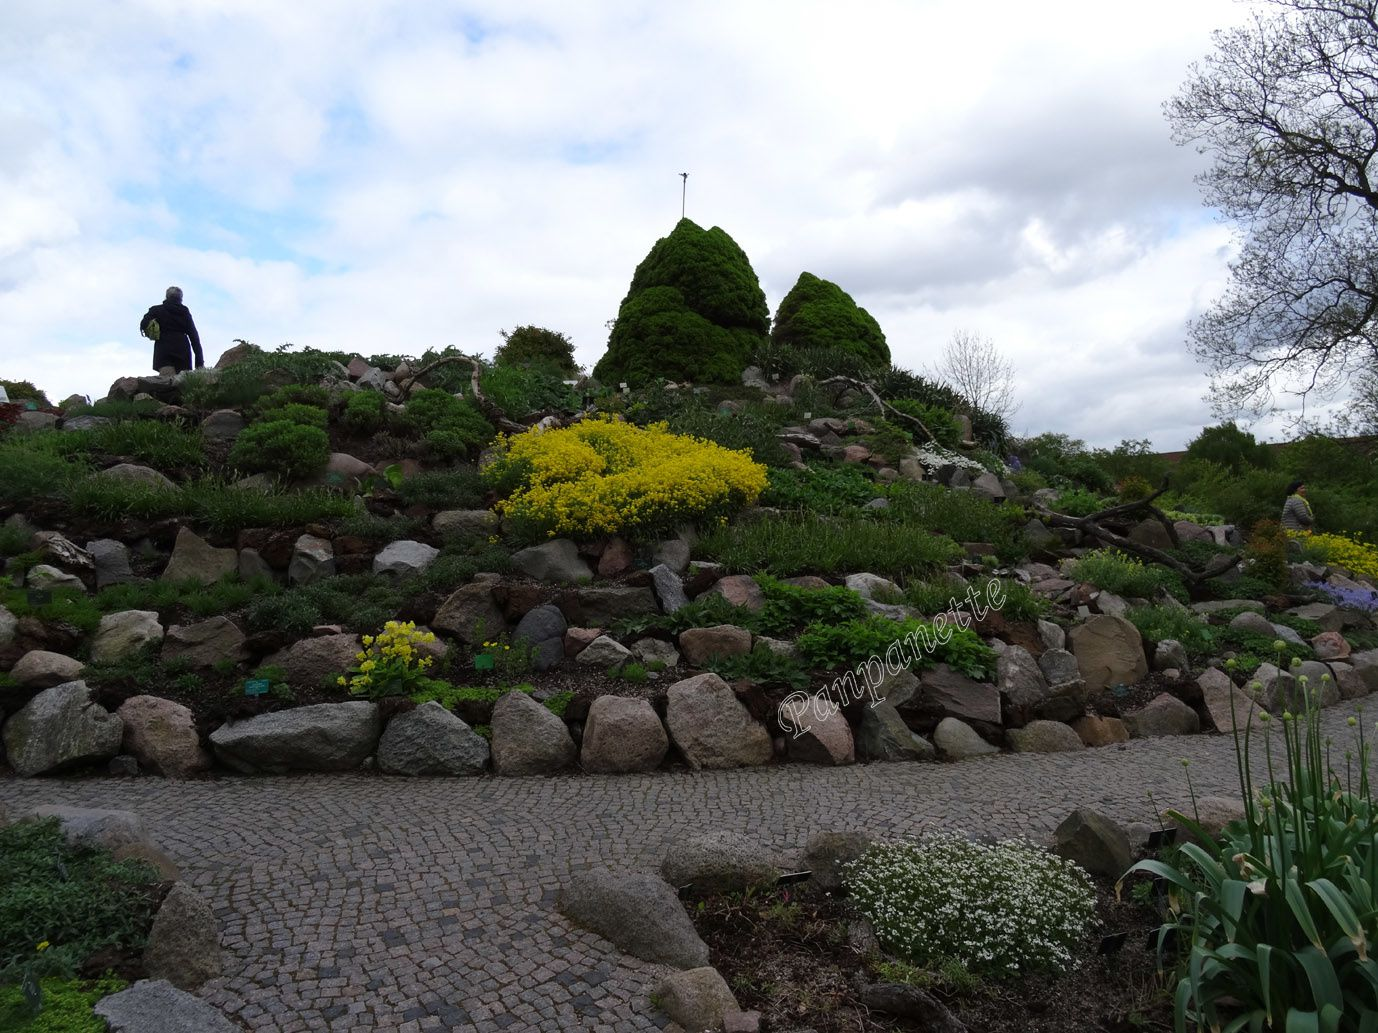 Danemark _5 Jardin botanique